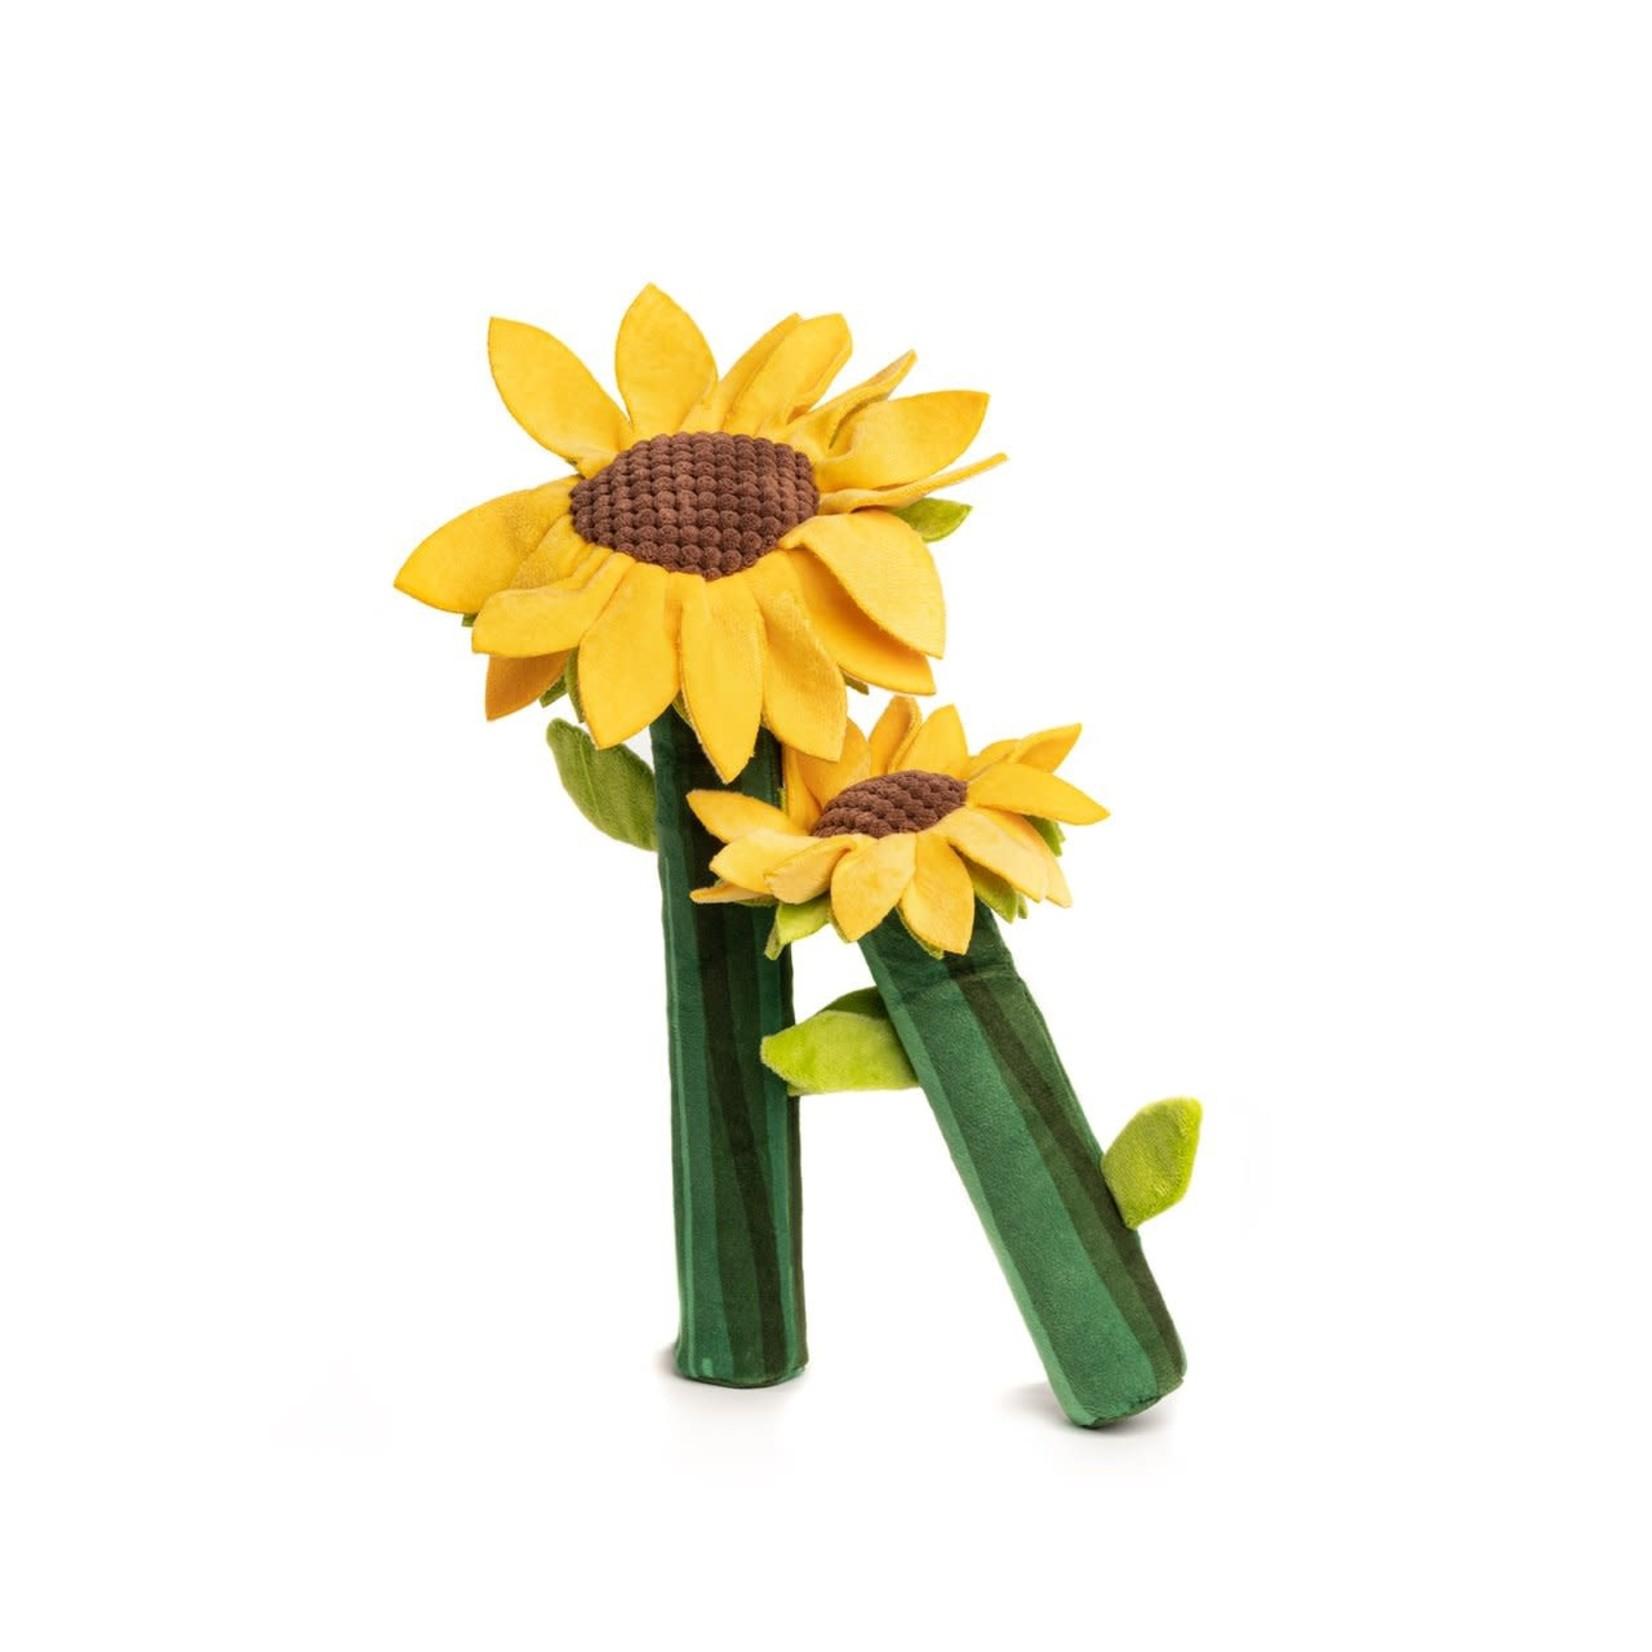 FabDog FAB DOG Bendie Sunflower Small